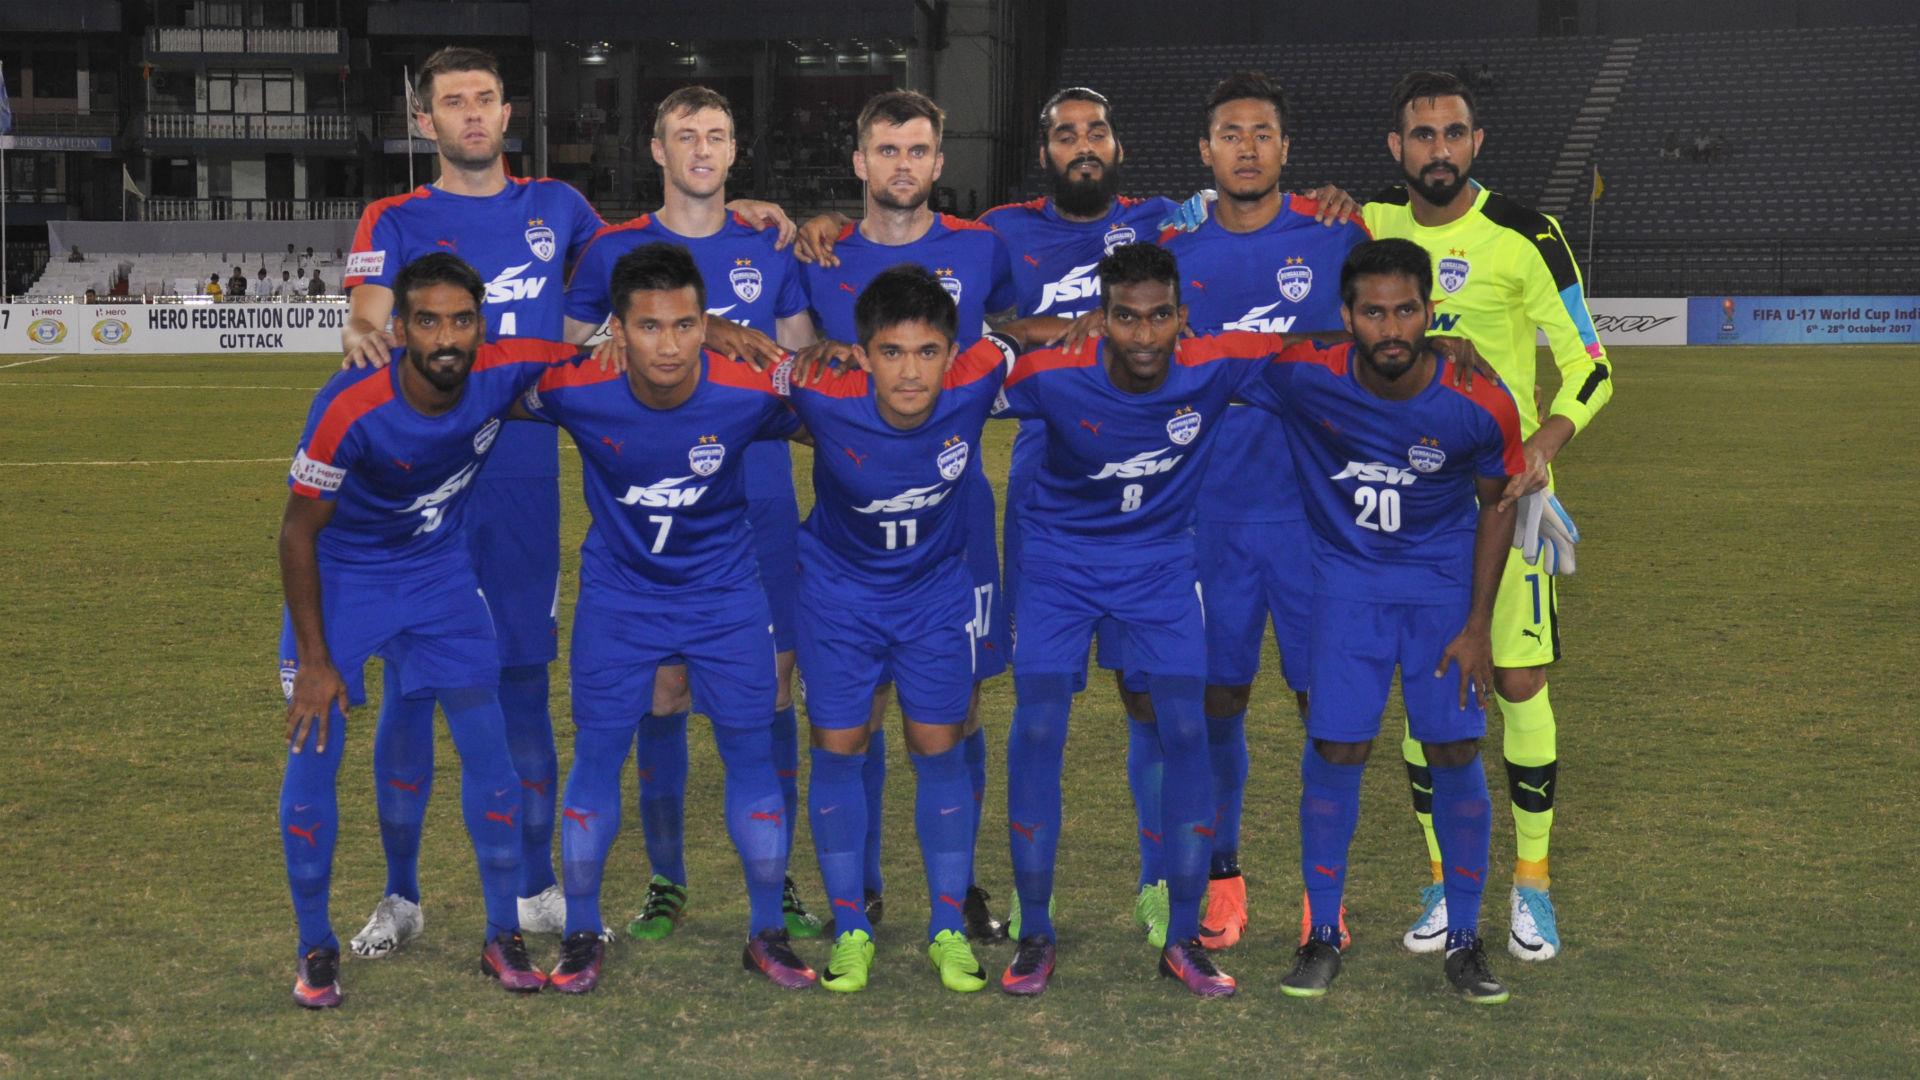 Bengaluru FC squad Federation Cup 2017